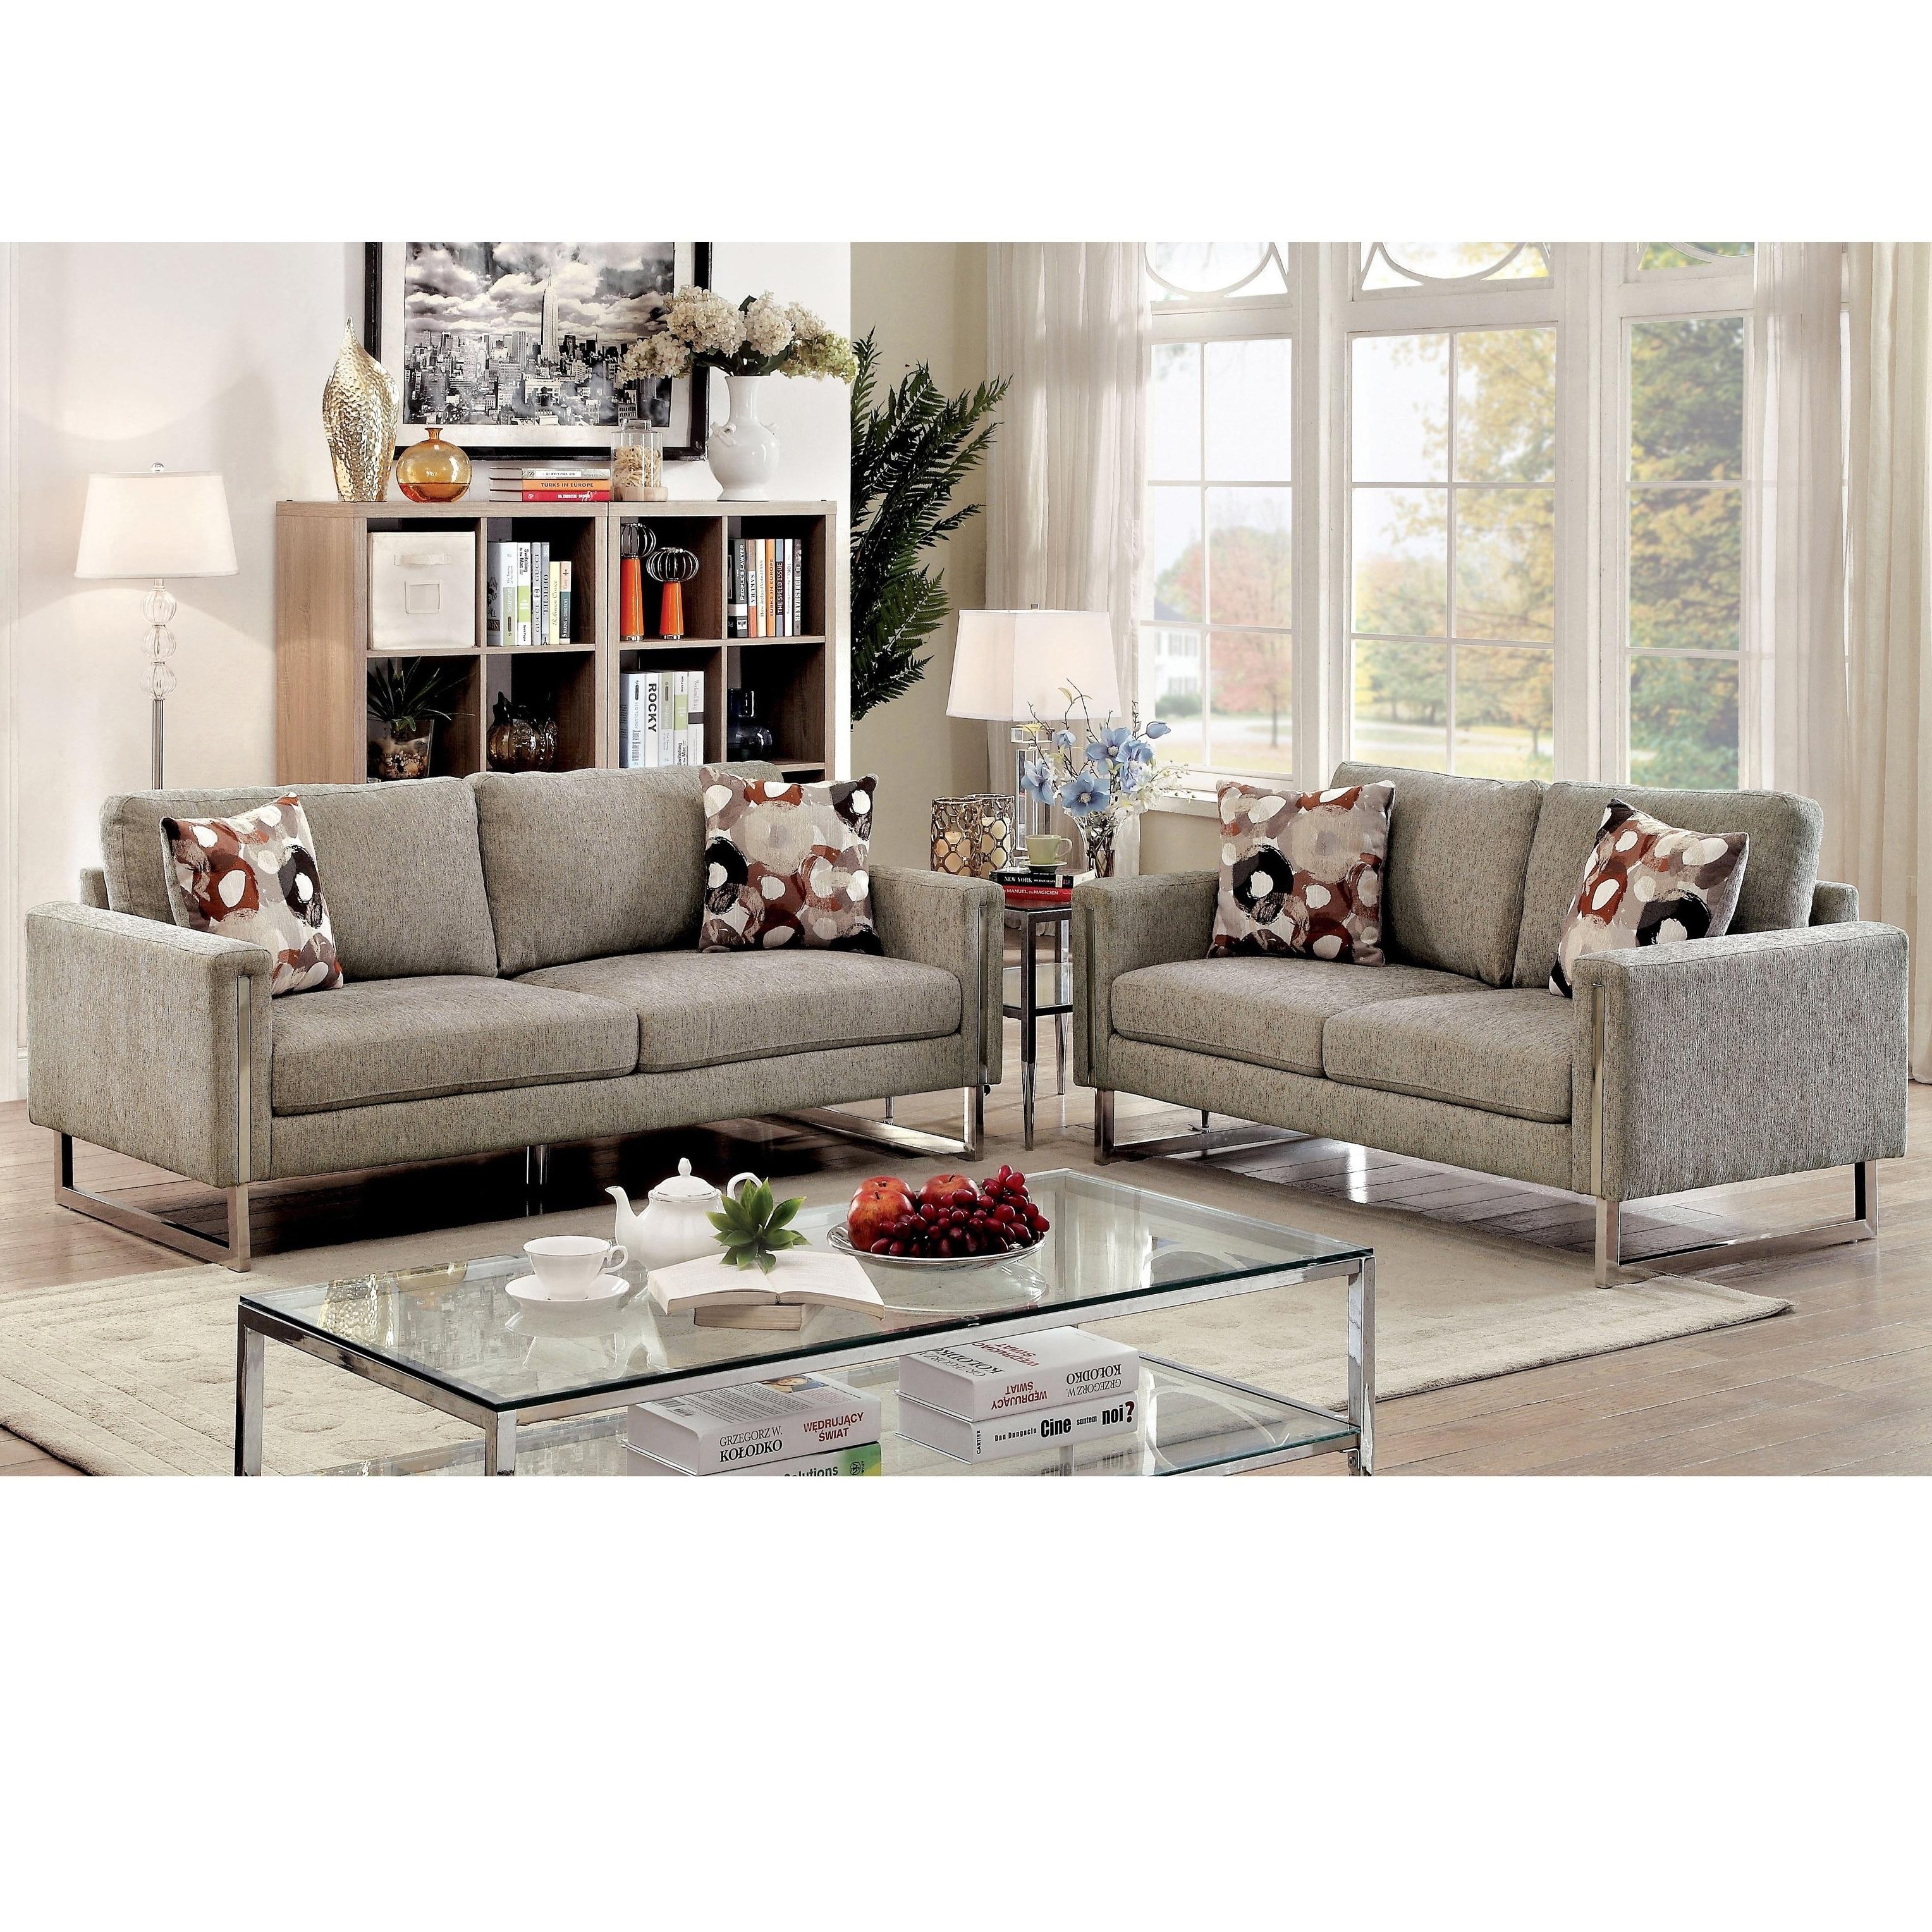 Furniture of America Madrid Contemporary 2-piece Pewter C...